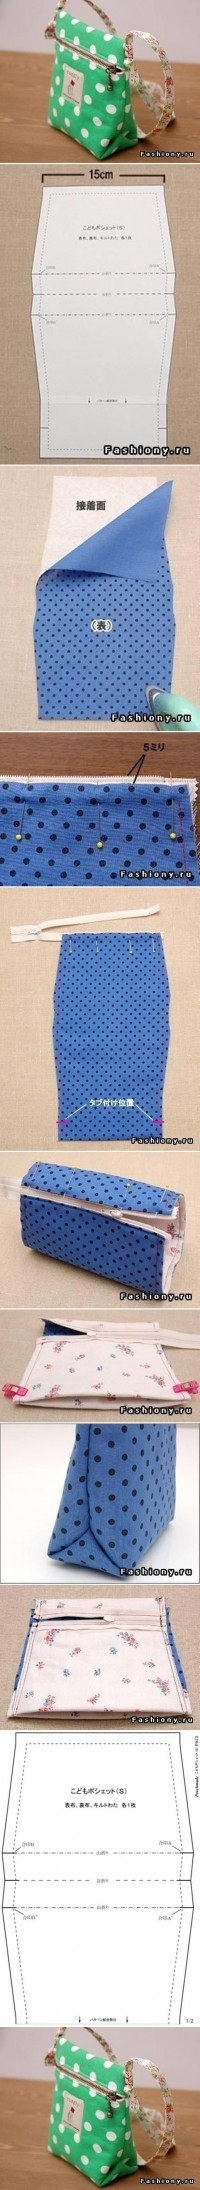 DIY Small Sew Handbag DIY Projects | UsefulDIY.com